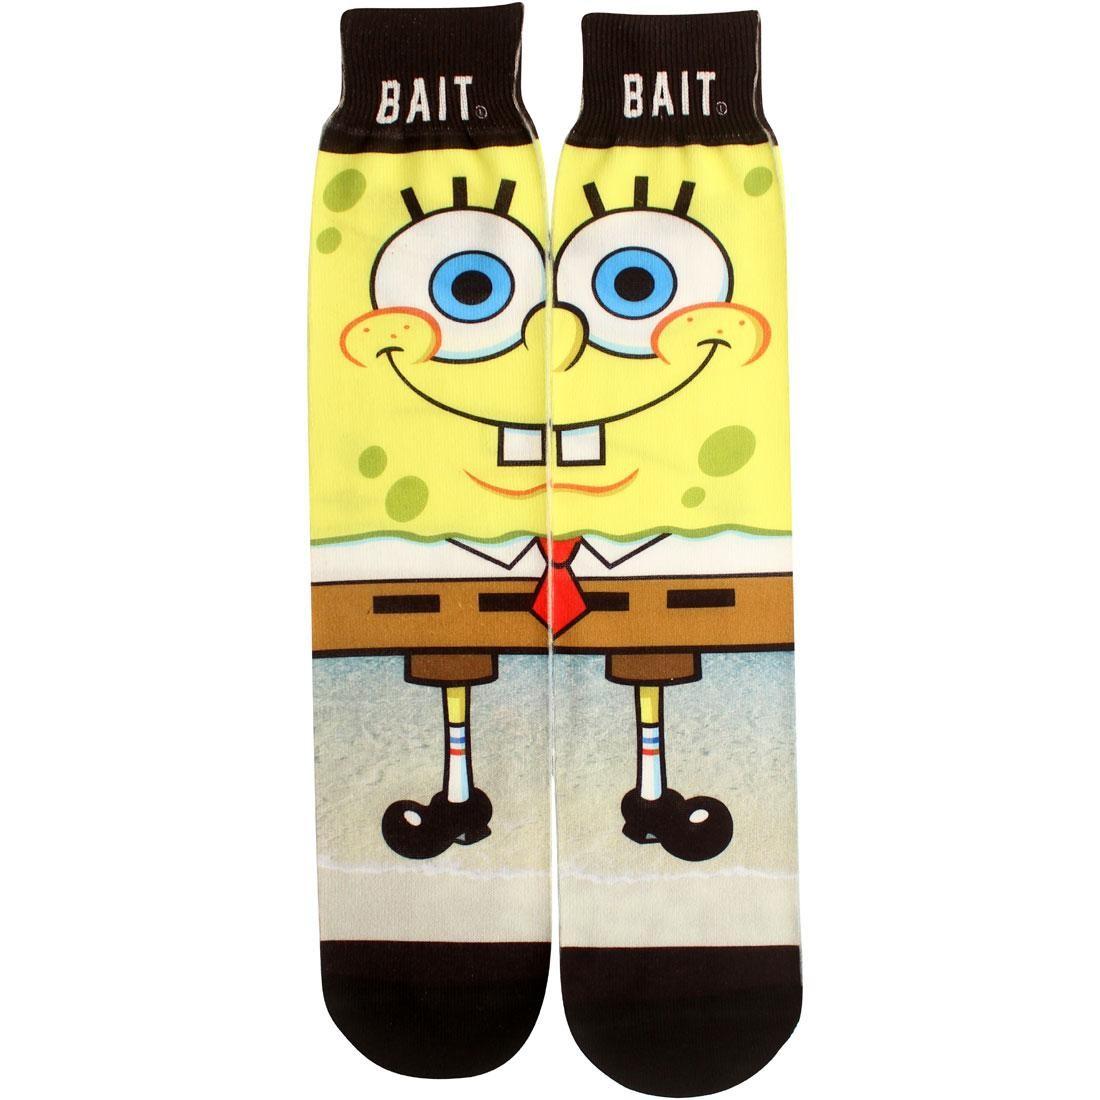 BAIT x SpongeBob SpongeBob SquarePants Crew Socks (yellow) 1S